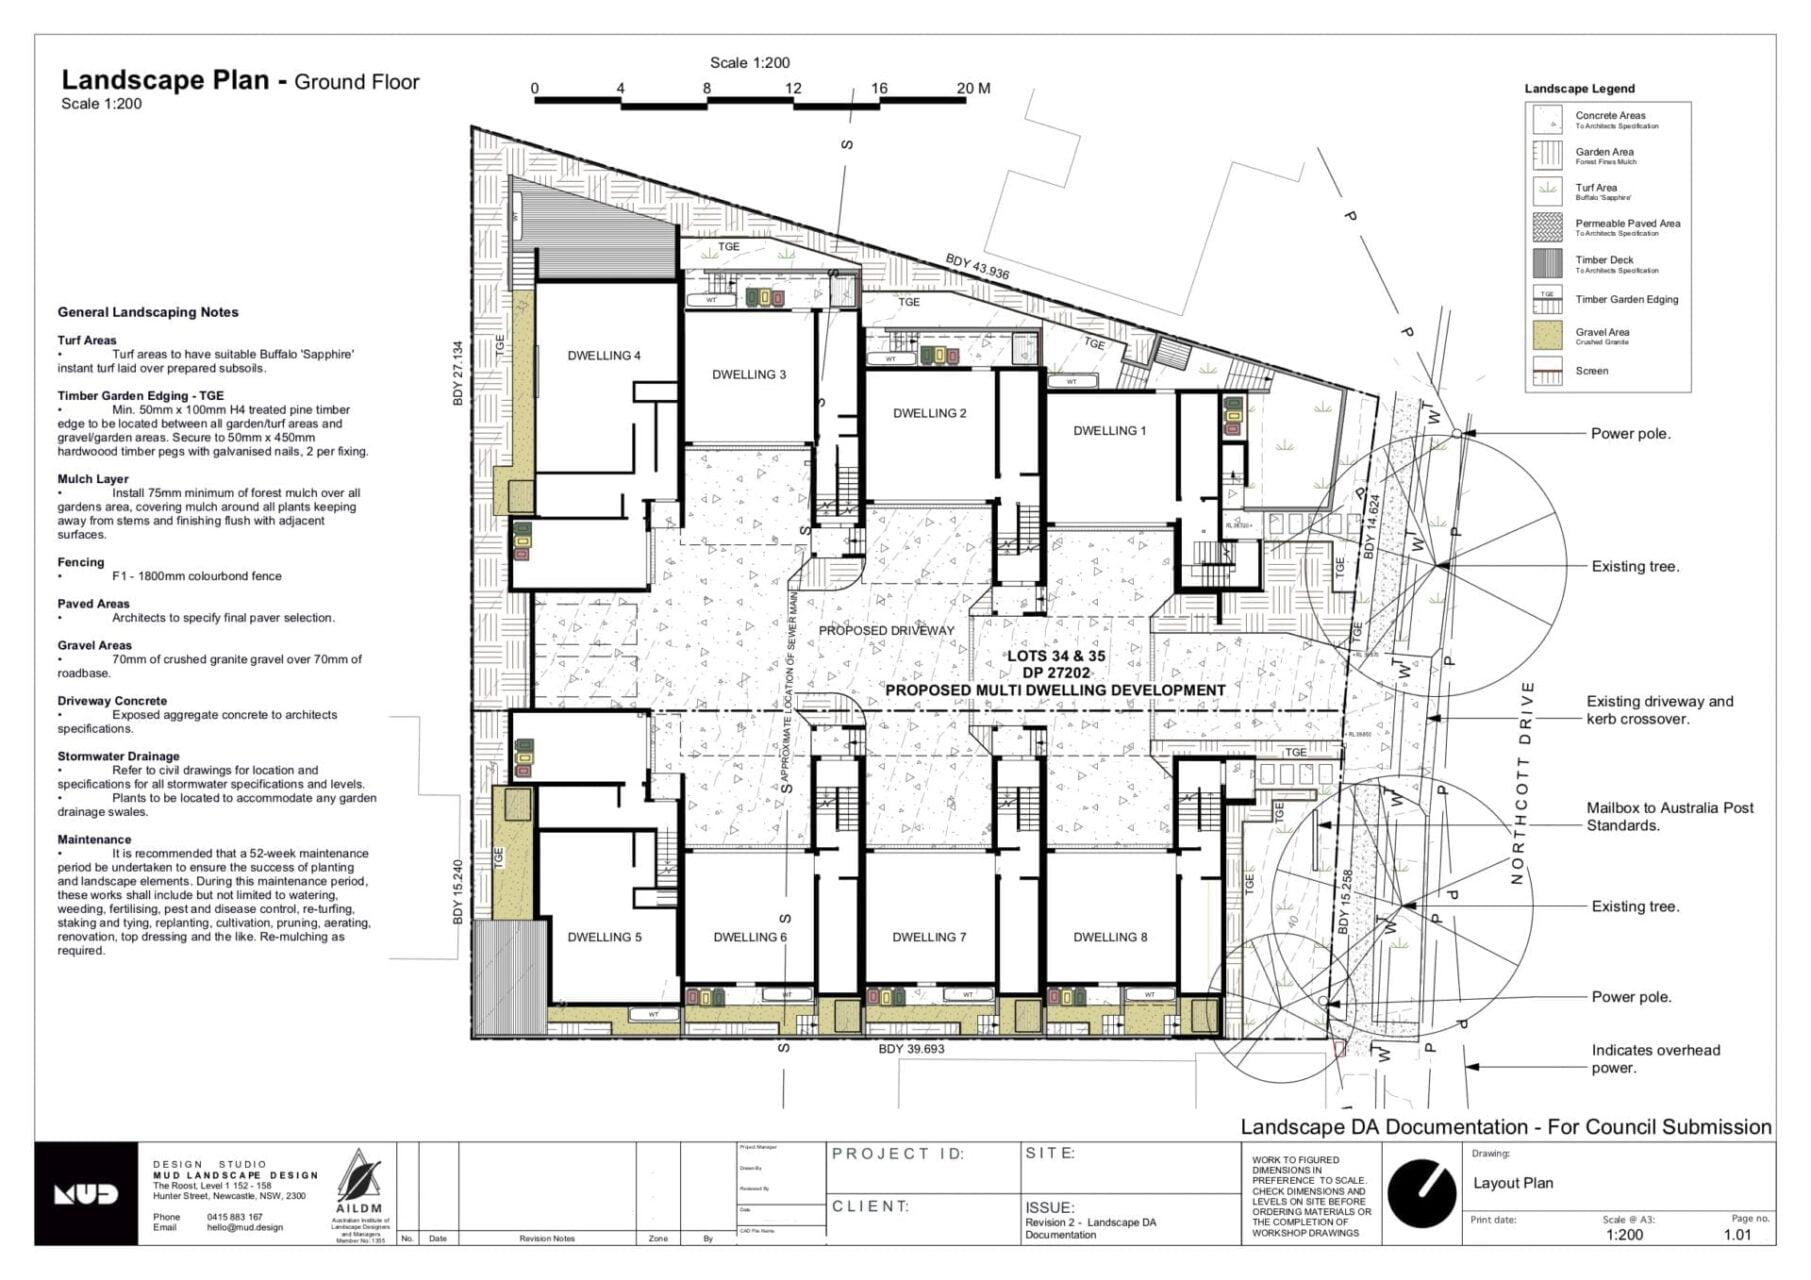 Landscape planting drawing for multi dwelling development